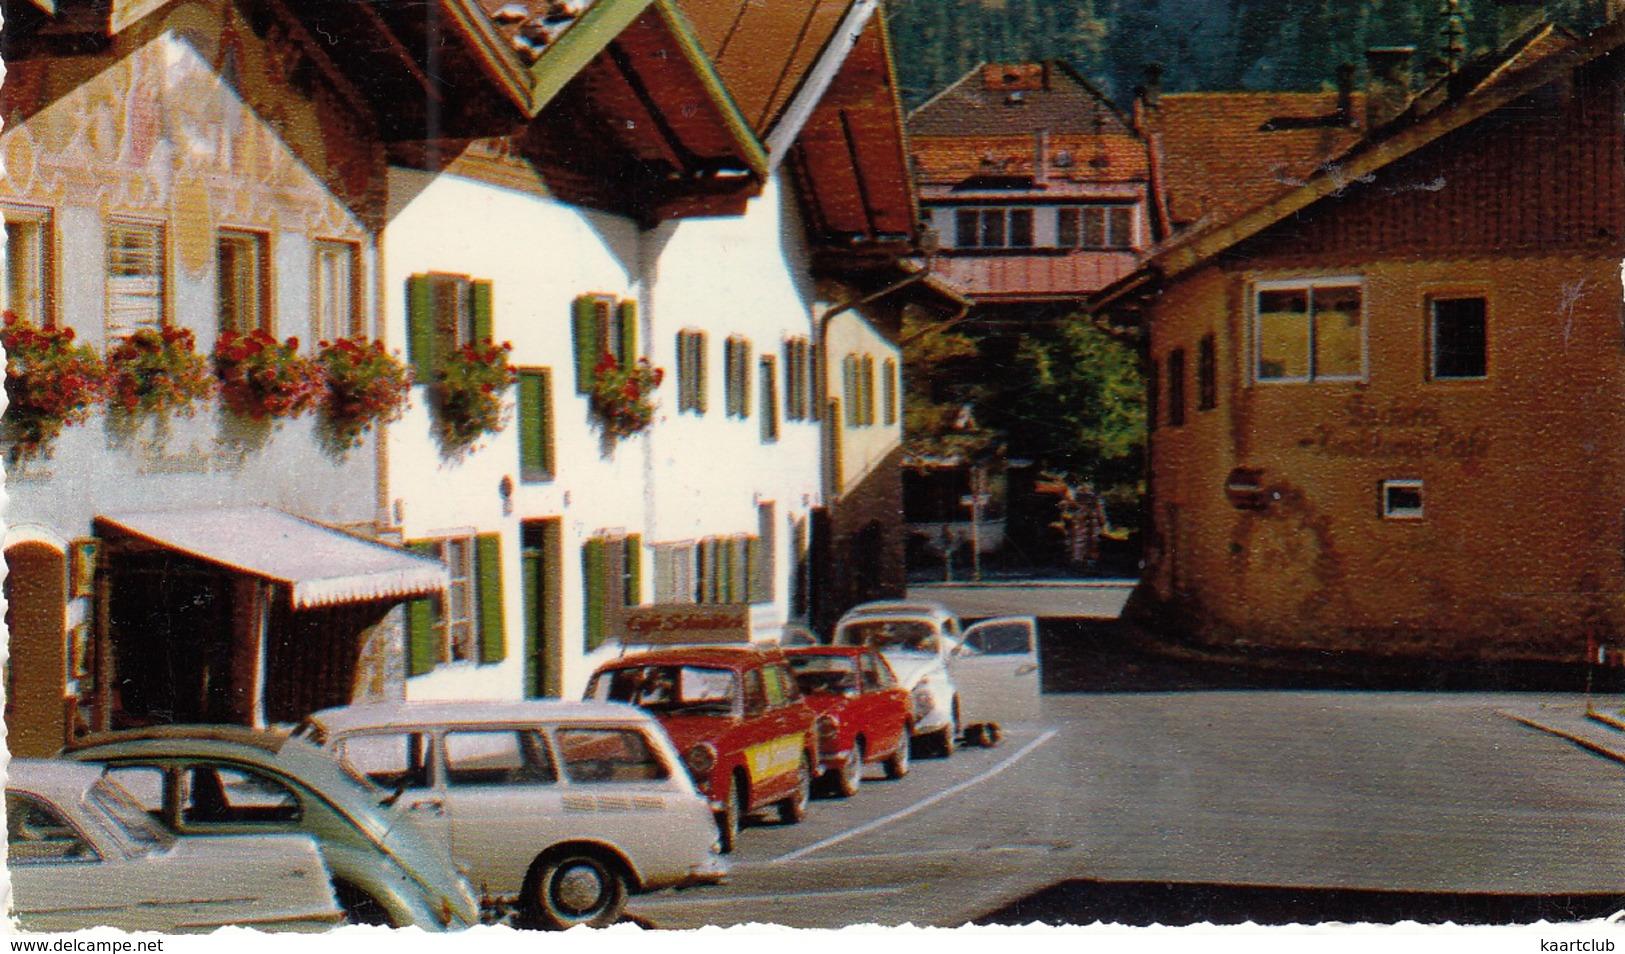 Mittenwald: OPEL REKORD P2, VW 1200 KÄFER/COX & 1500 VARIANT, FIAT 850 COUPÉ - Karwendelgebirge 2385 M  - (D) - Toerisme